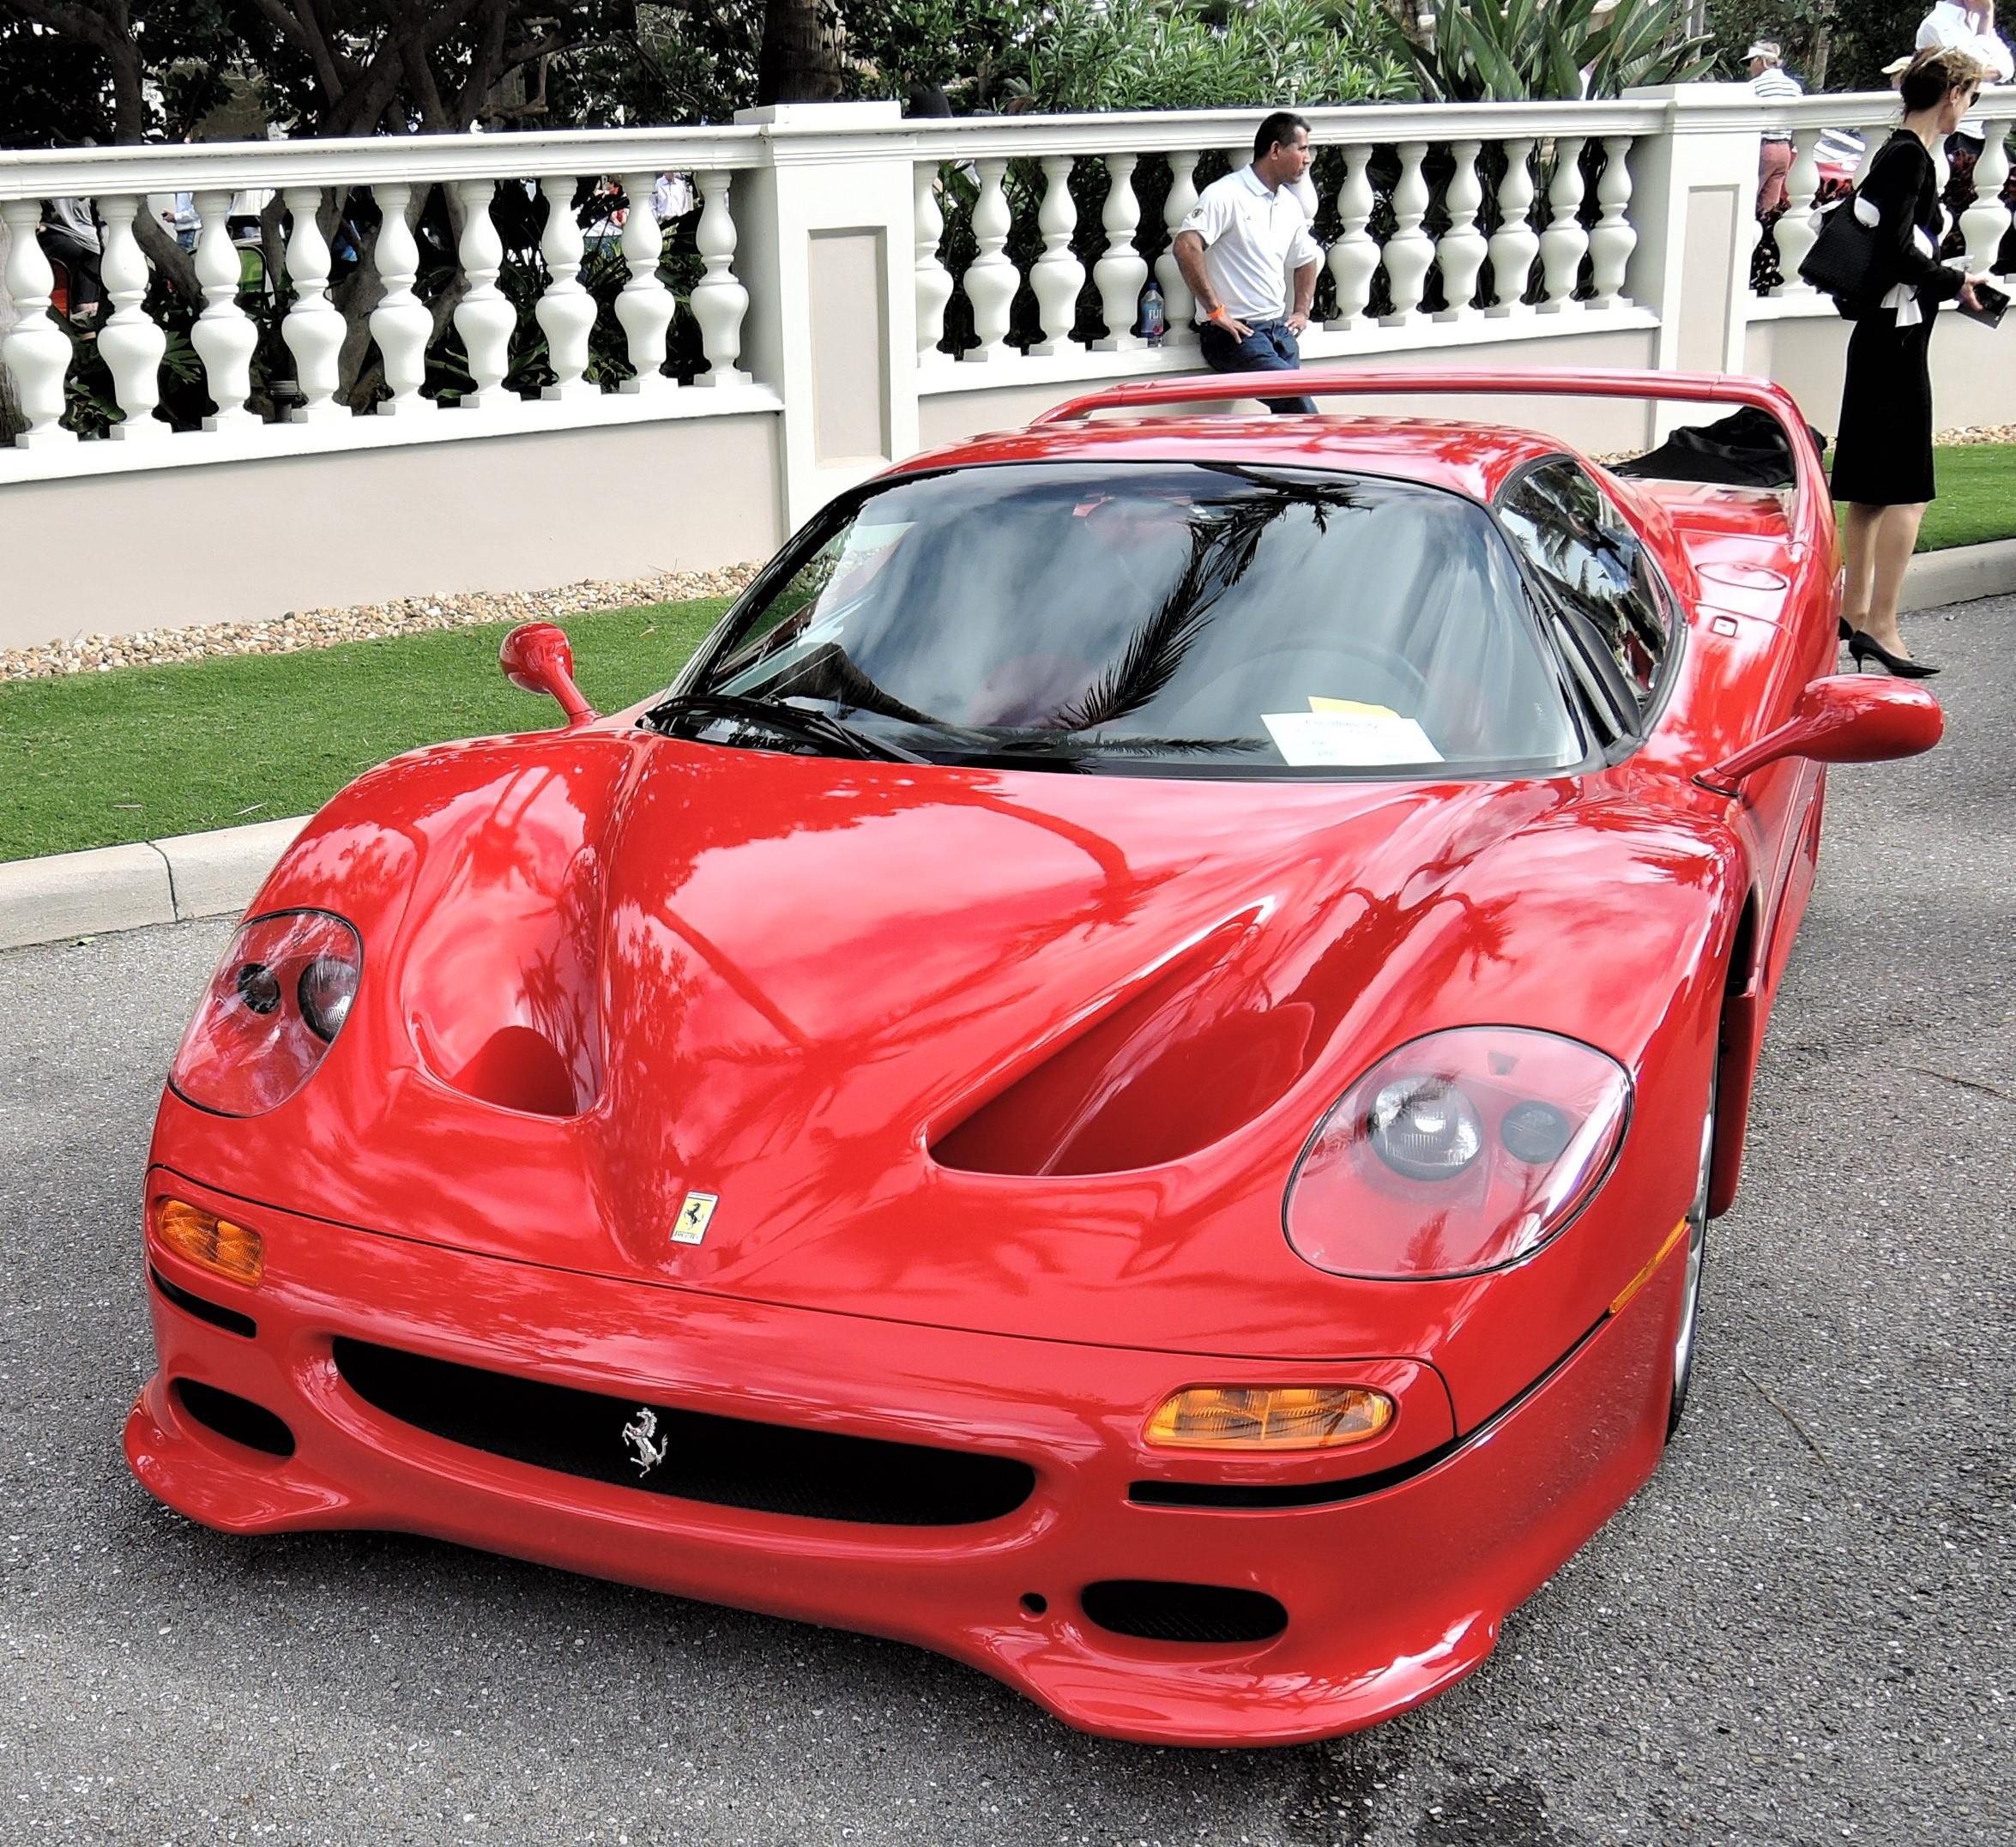 red 1995 Ferrari F50; Sn 104121 - Cavallino 2018 Concours